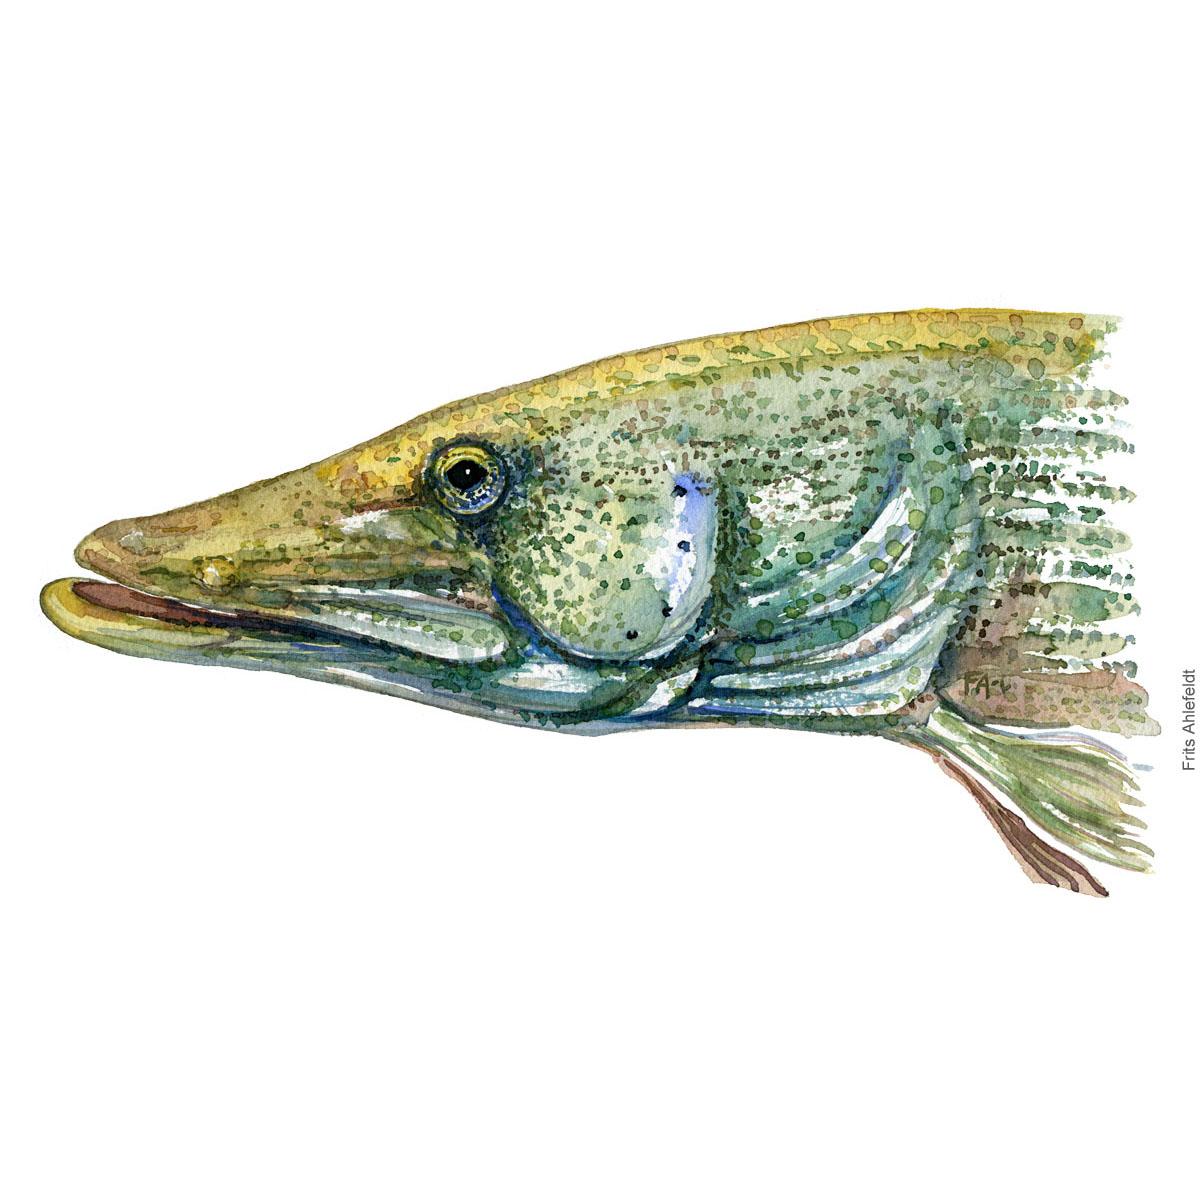 Gedde - Pike fish watercolor illustration. Painting by Frits Ahlefeldt. Fiske akvarel